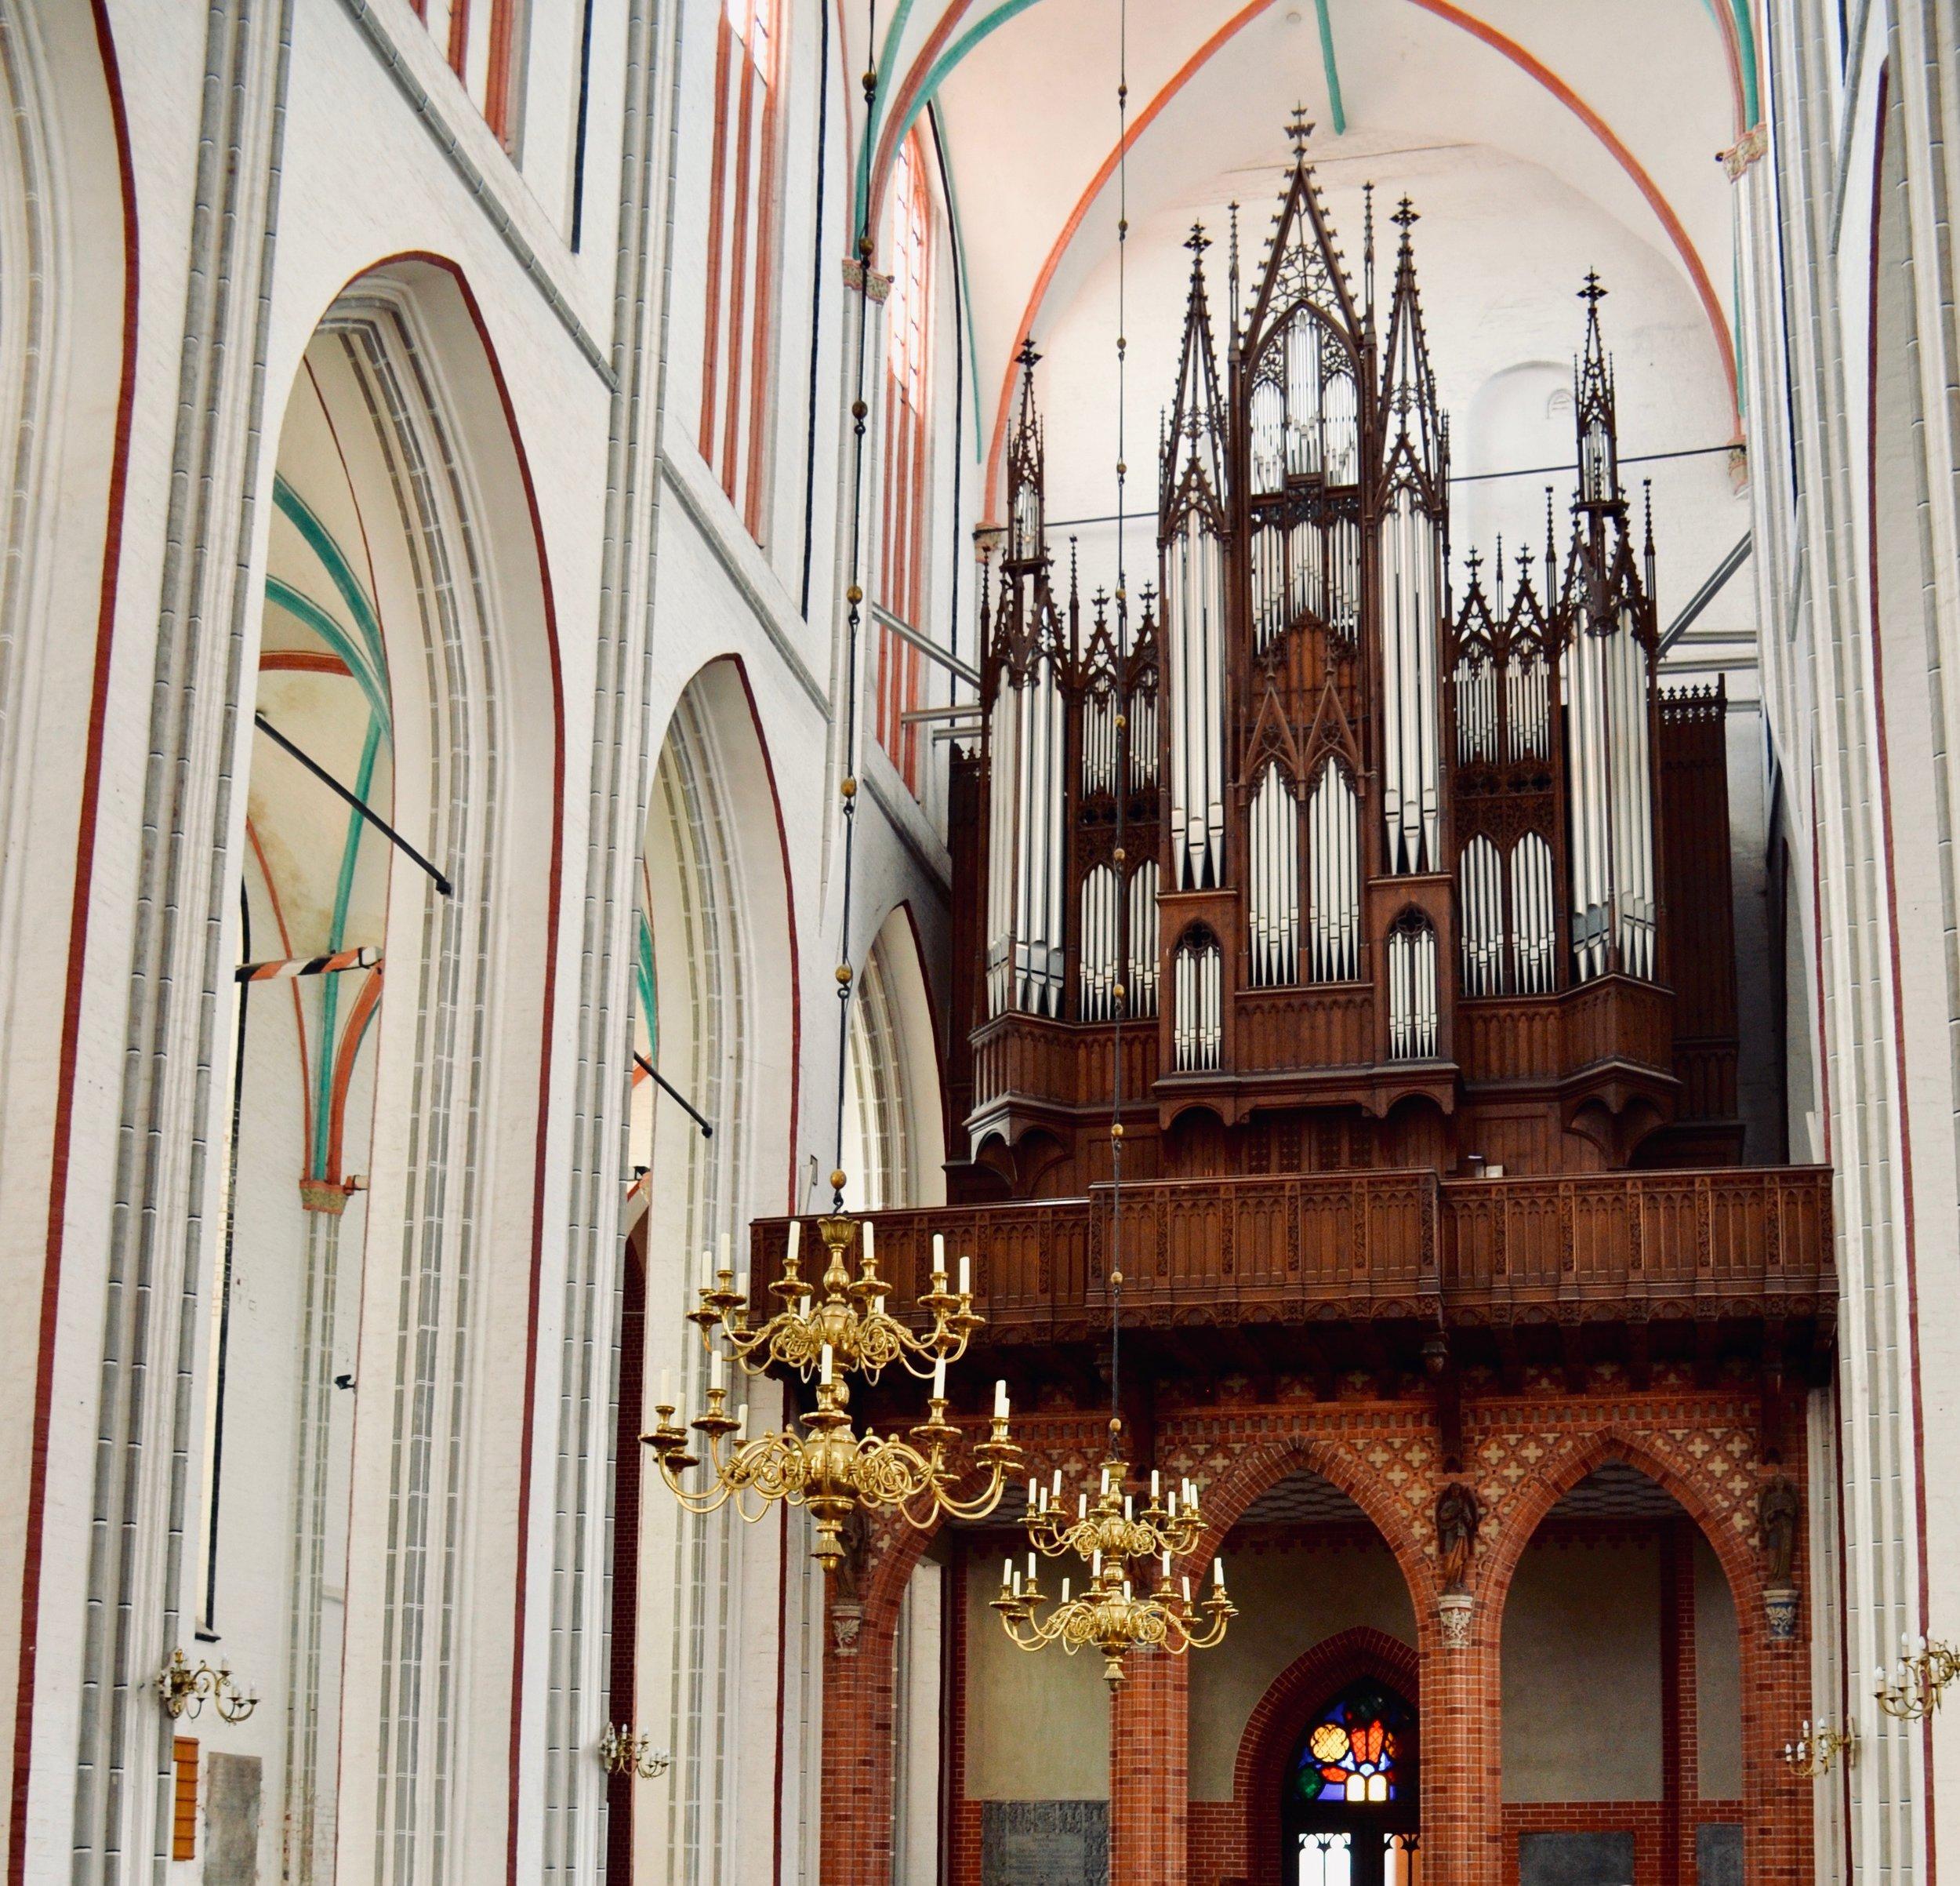 1871 Ladegast Organ, Schwerin Dom. Boston Organ Studio.